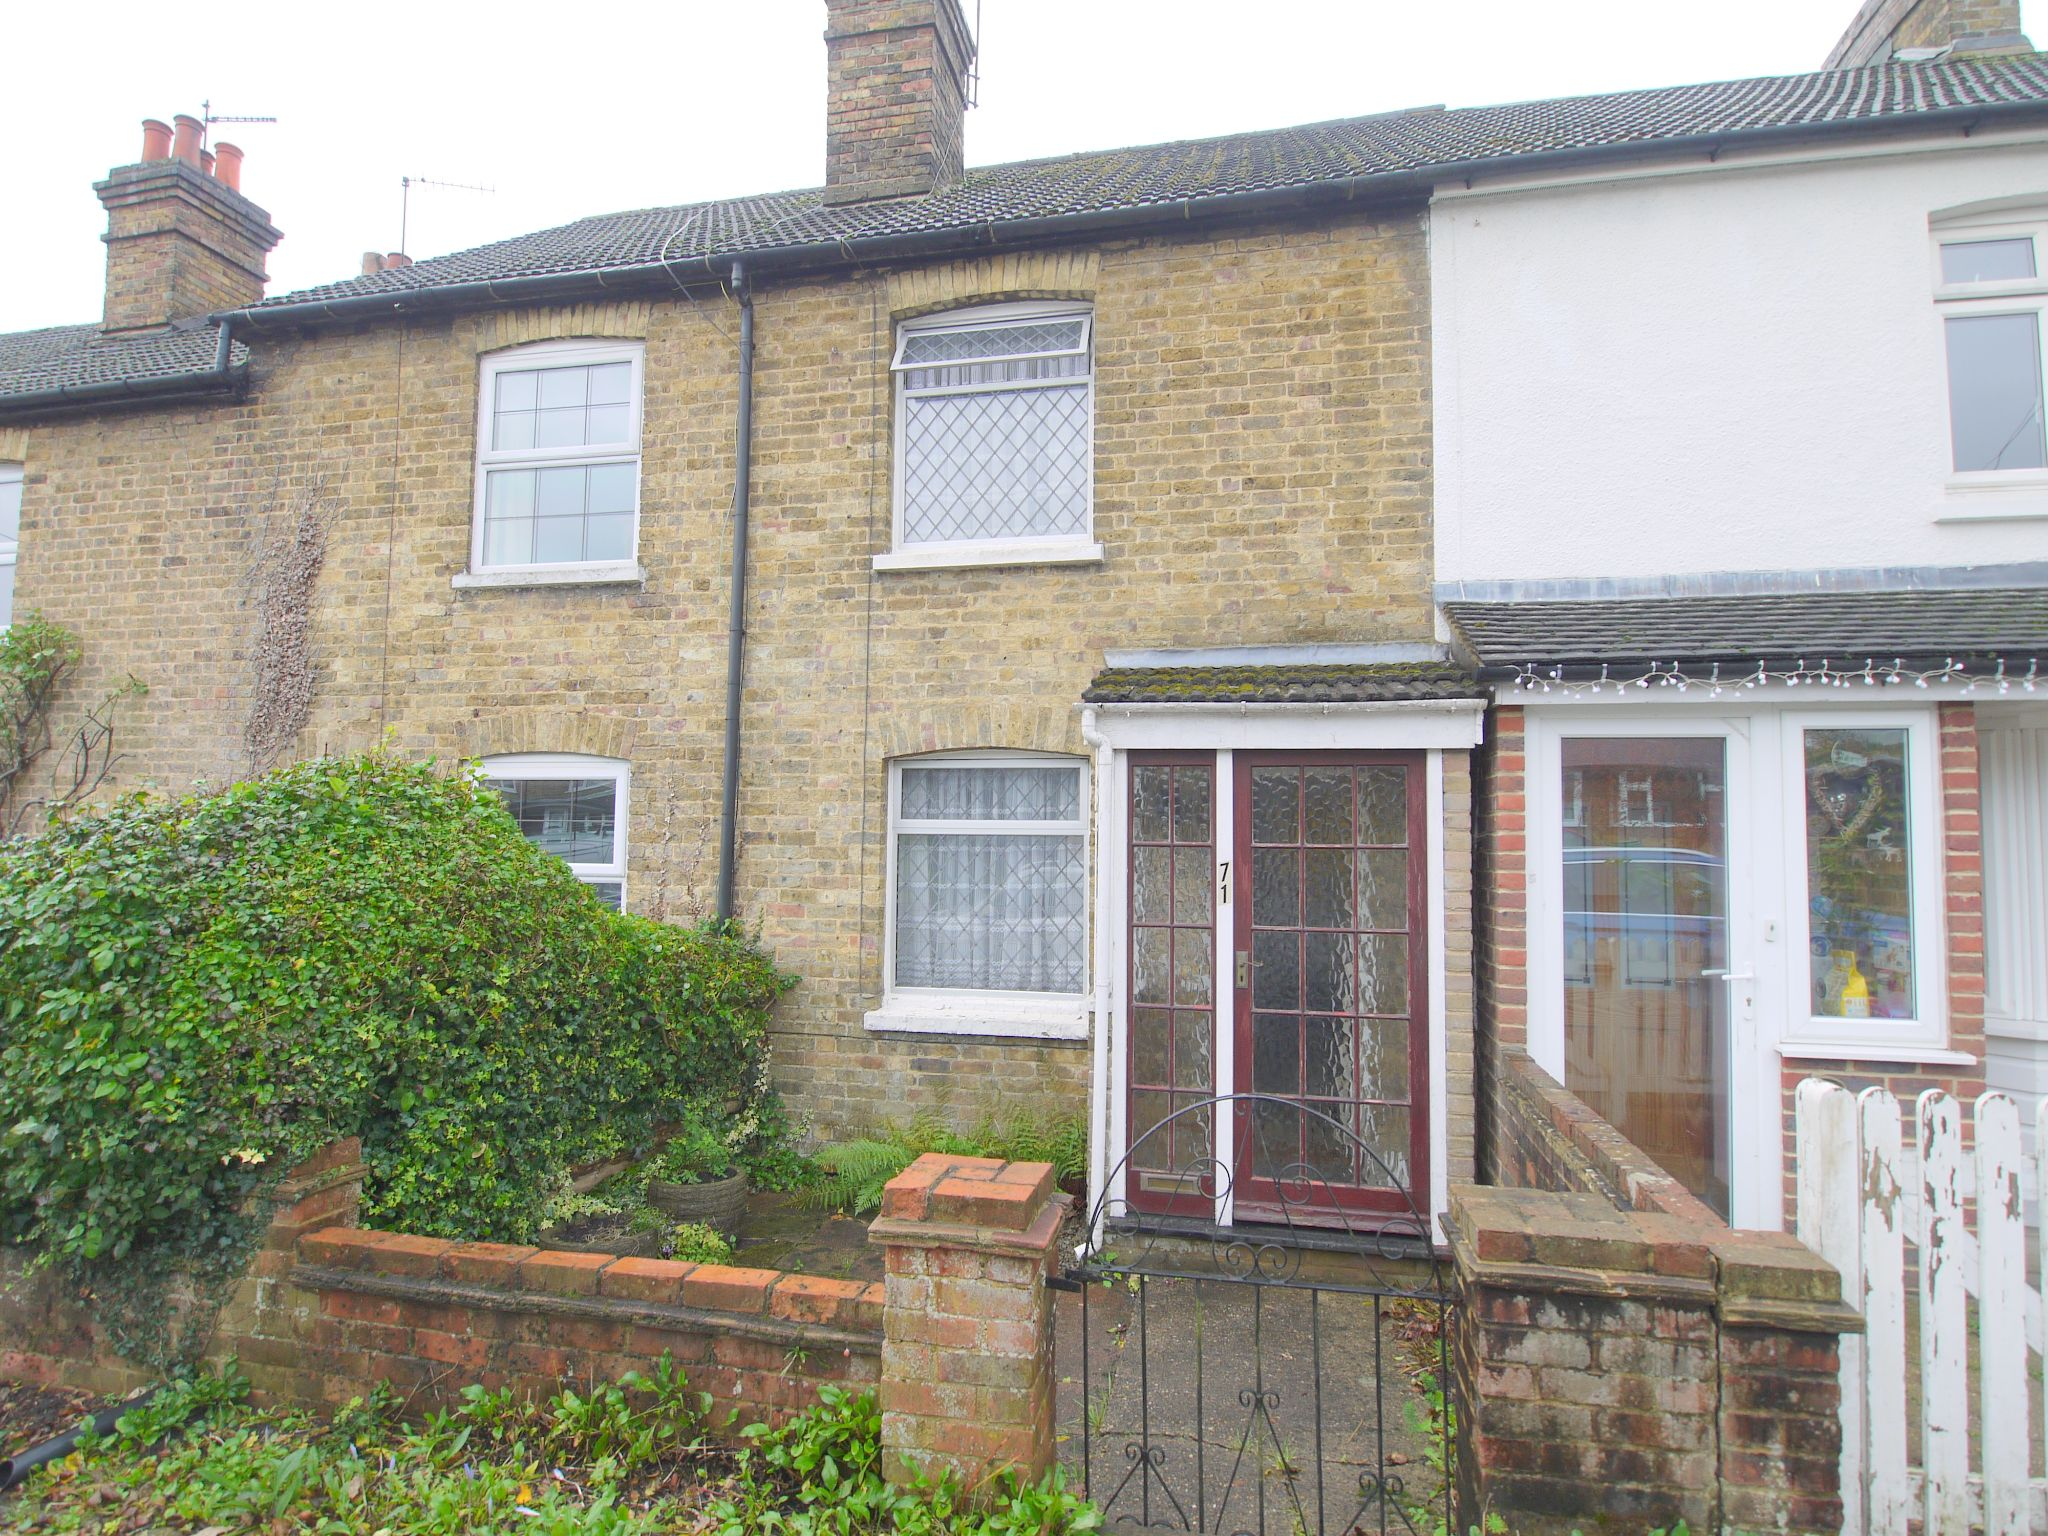 2 bedroom mid terraced house For Sale in Sevenoaks - Photograph 1